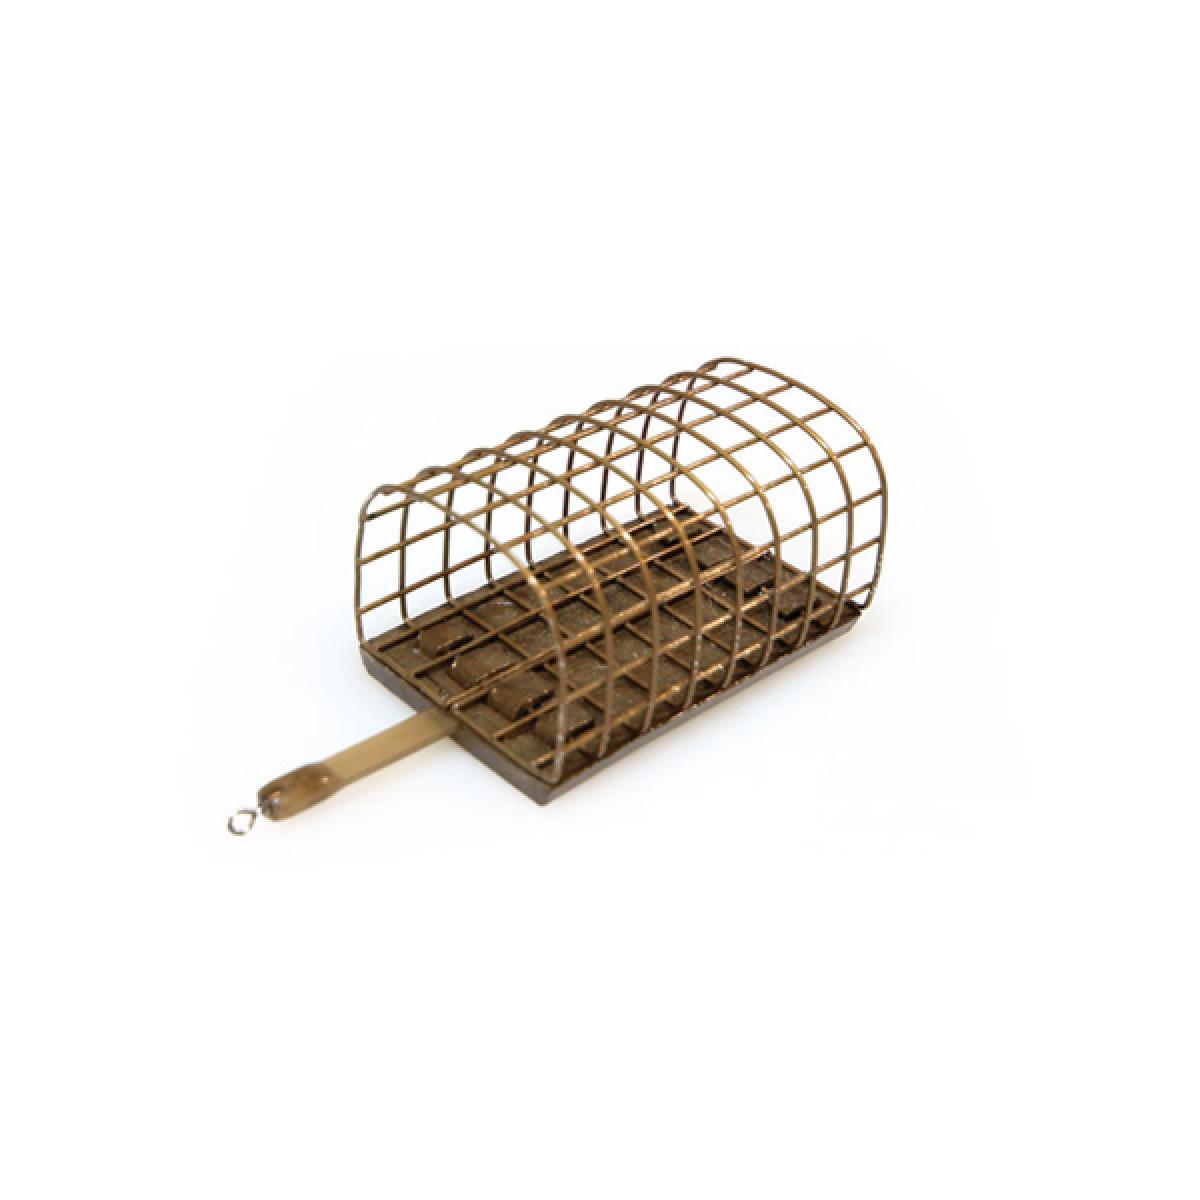 Heavyweight Cage Feeder